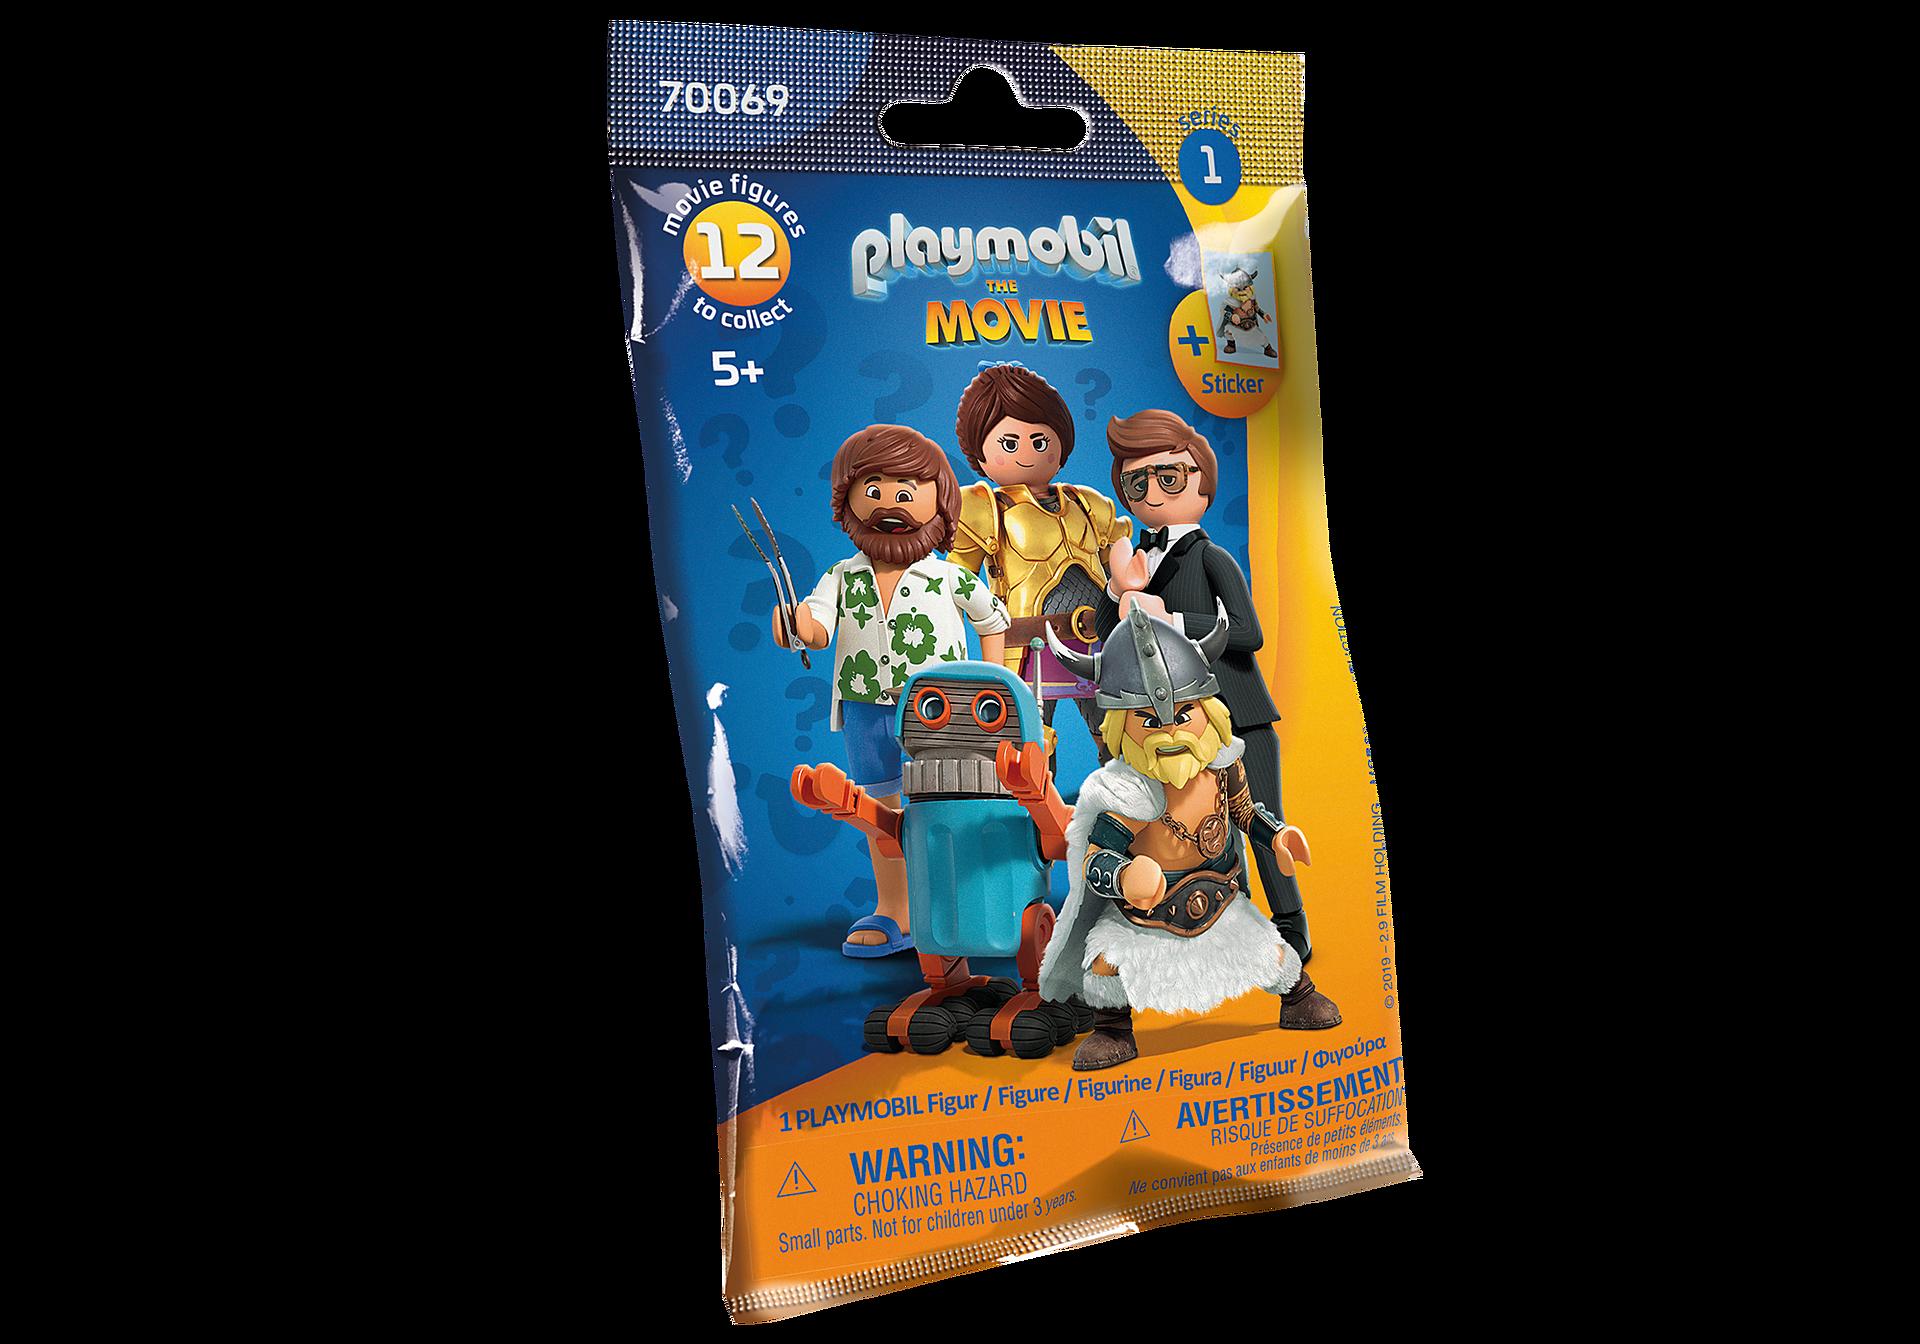 http://media.playmobil.com/i/playmobil/70069_product_box_front/PLAYMOBIL: THE MOVIE - Figures (1. edycja)